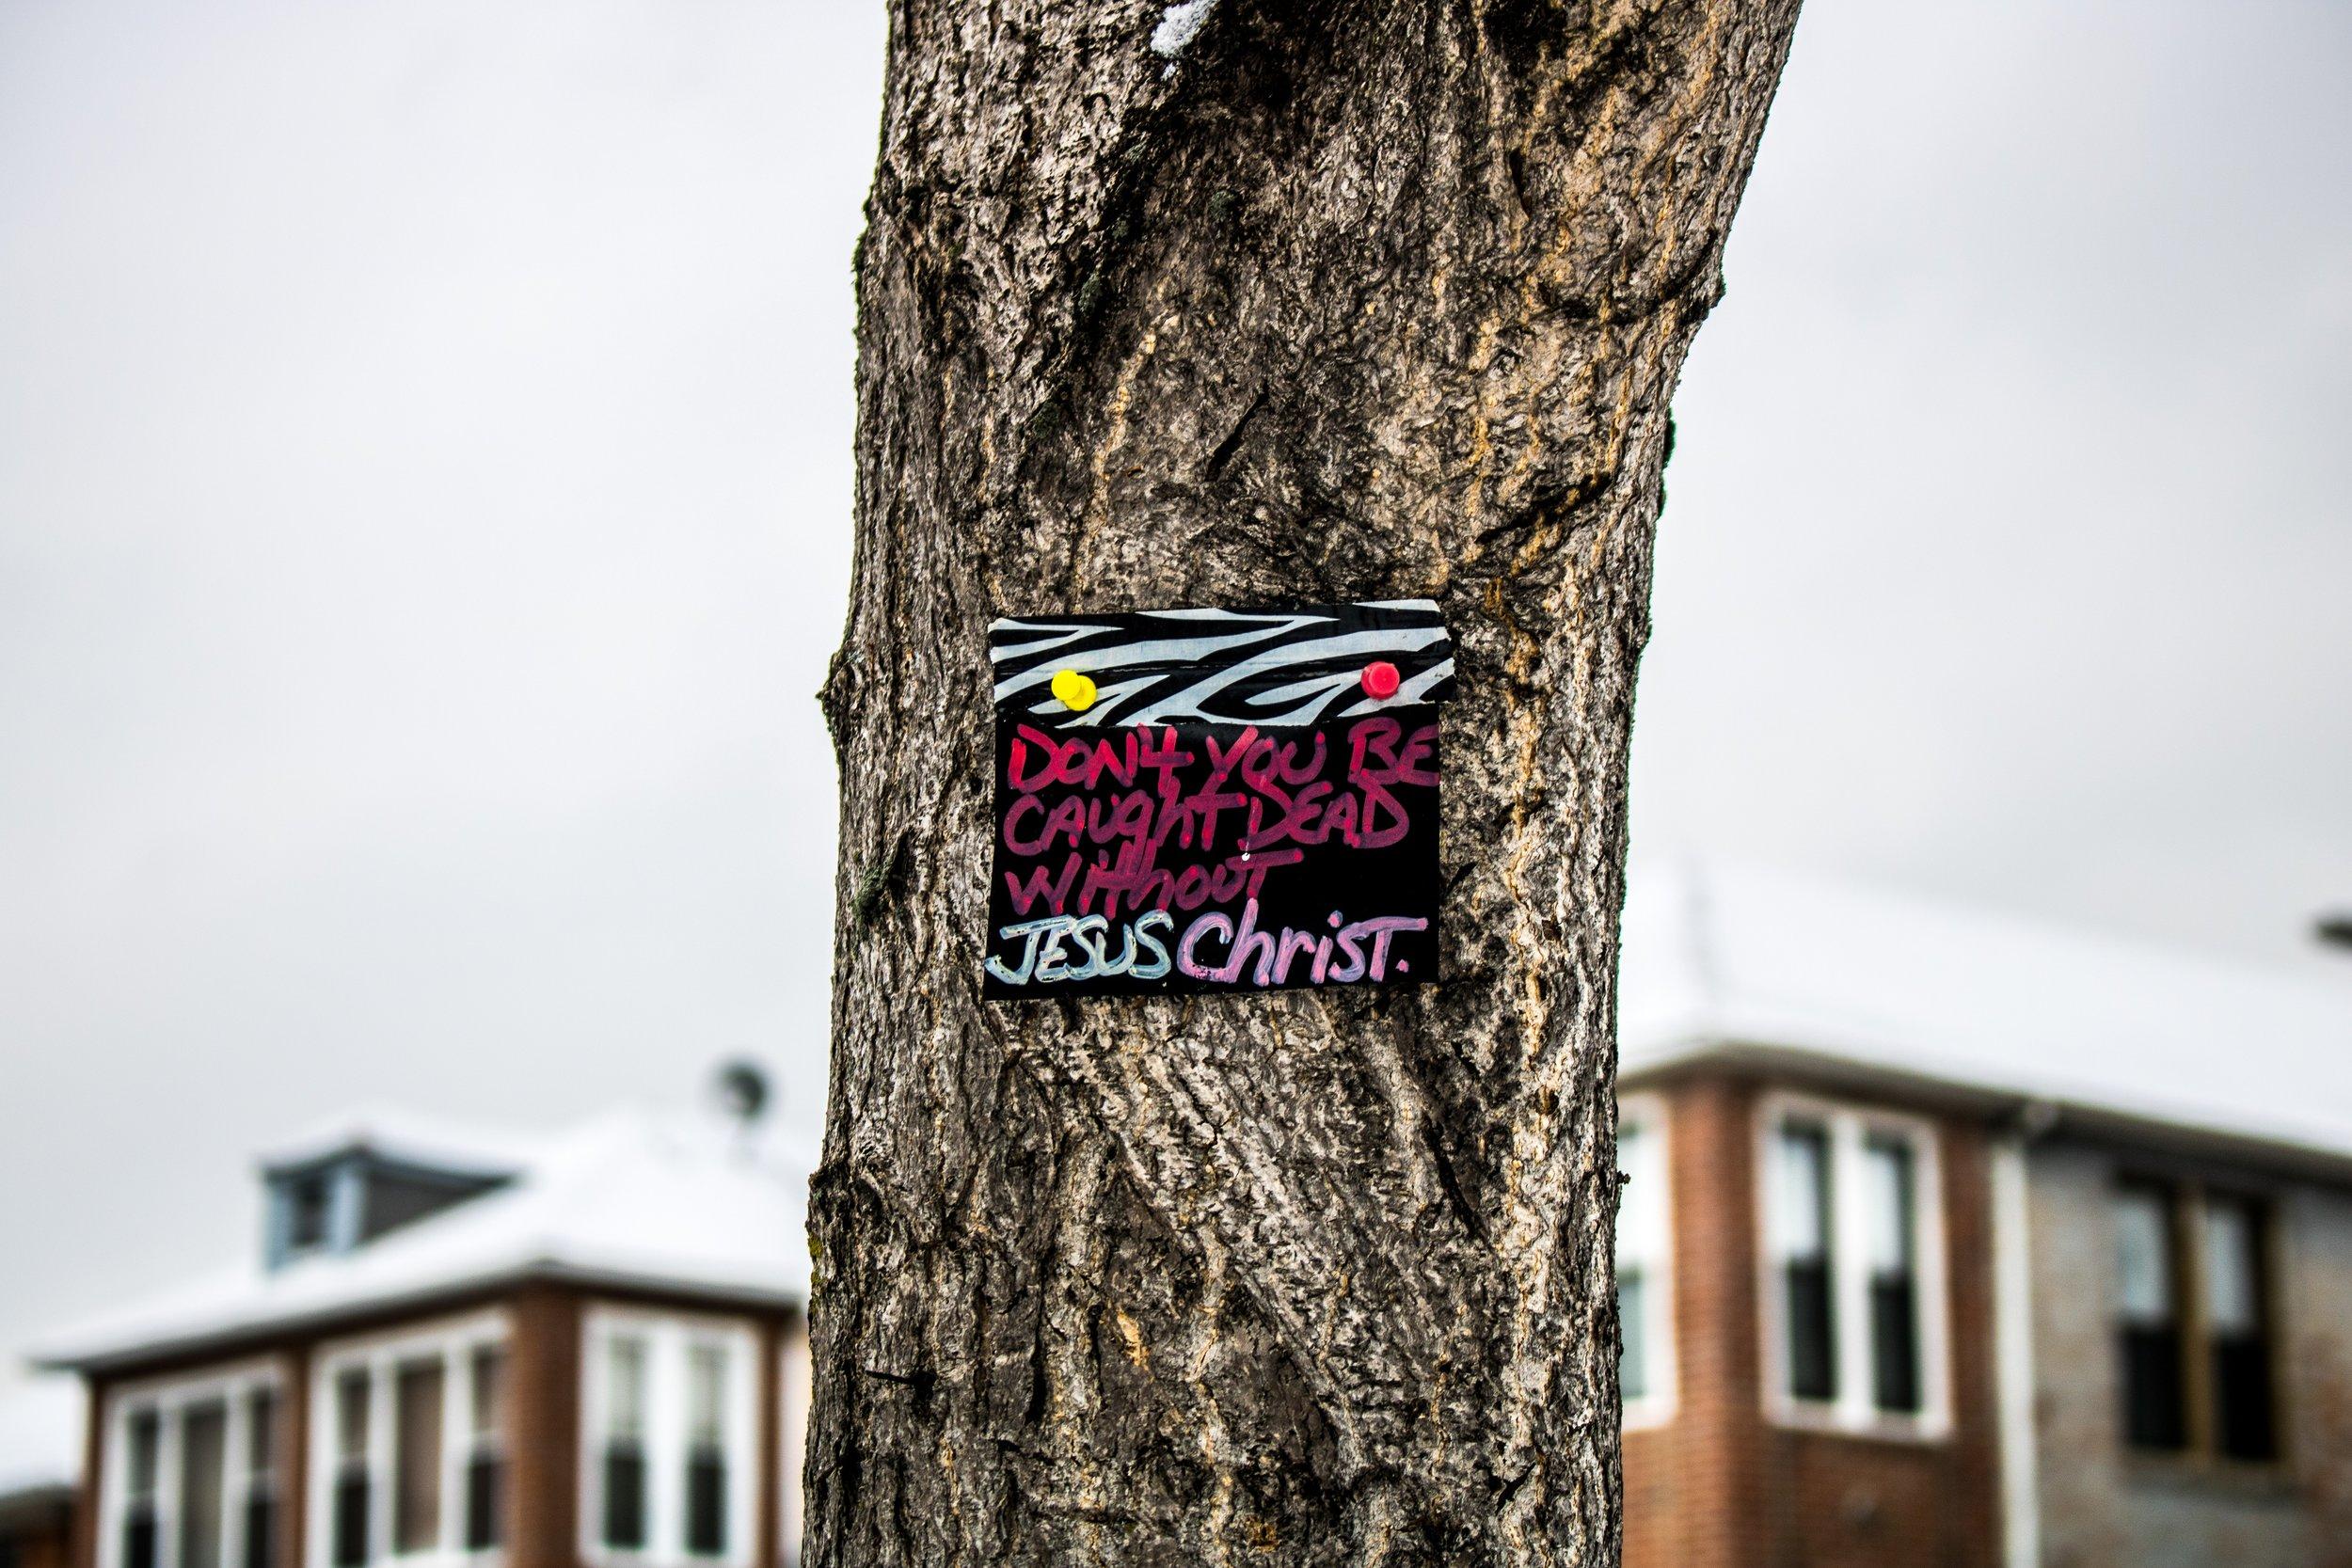 Jesus Christ Urban Sign